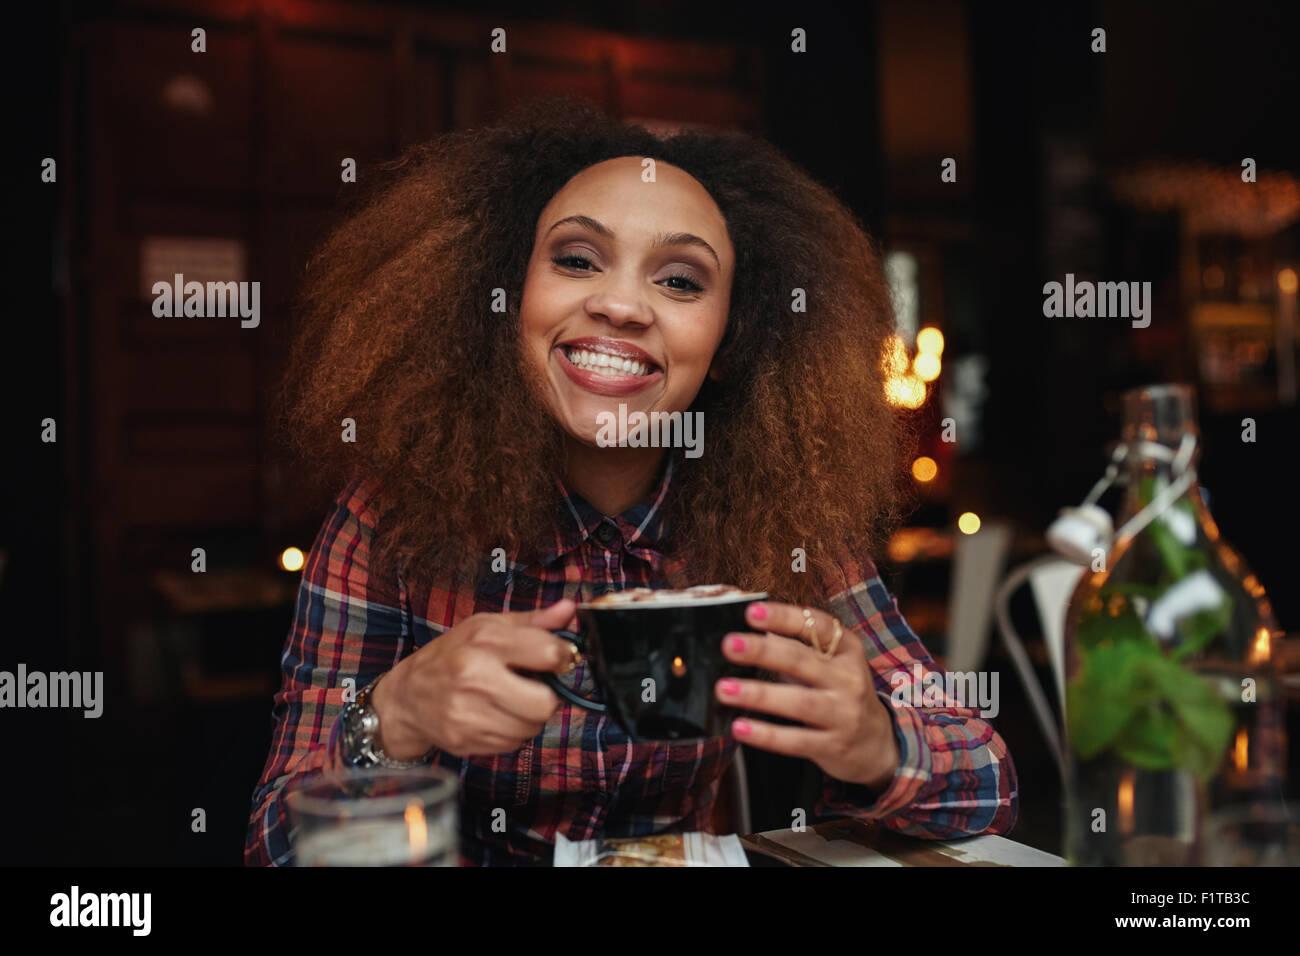 Porträt der jungen Frau Kaffee trinken. Afrikanische Frau sitzen im Café hält eine Tasse Kaffee, Stockbild